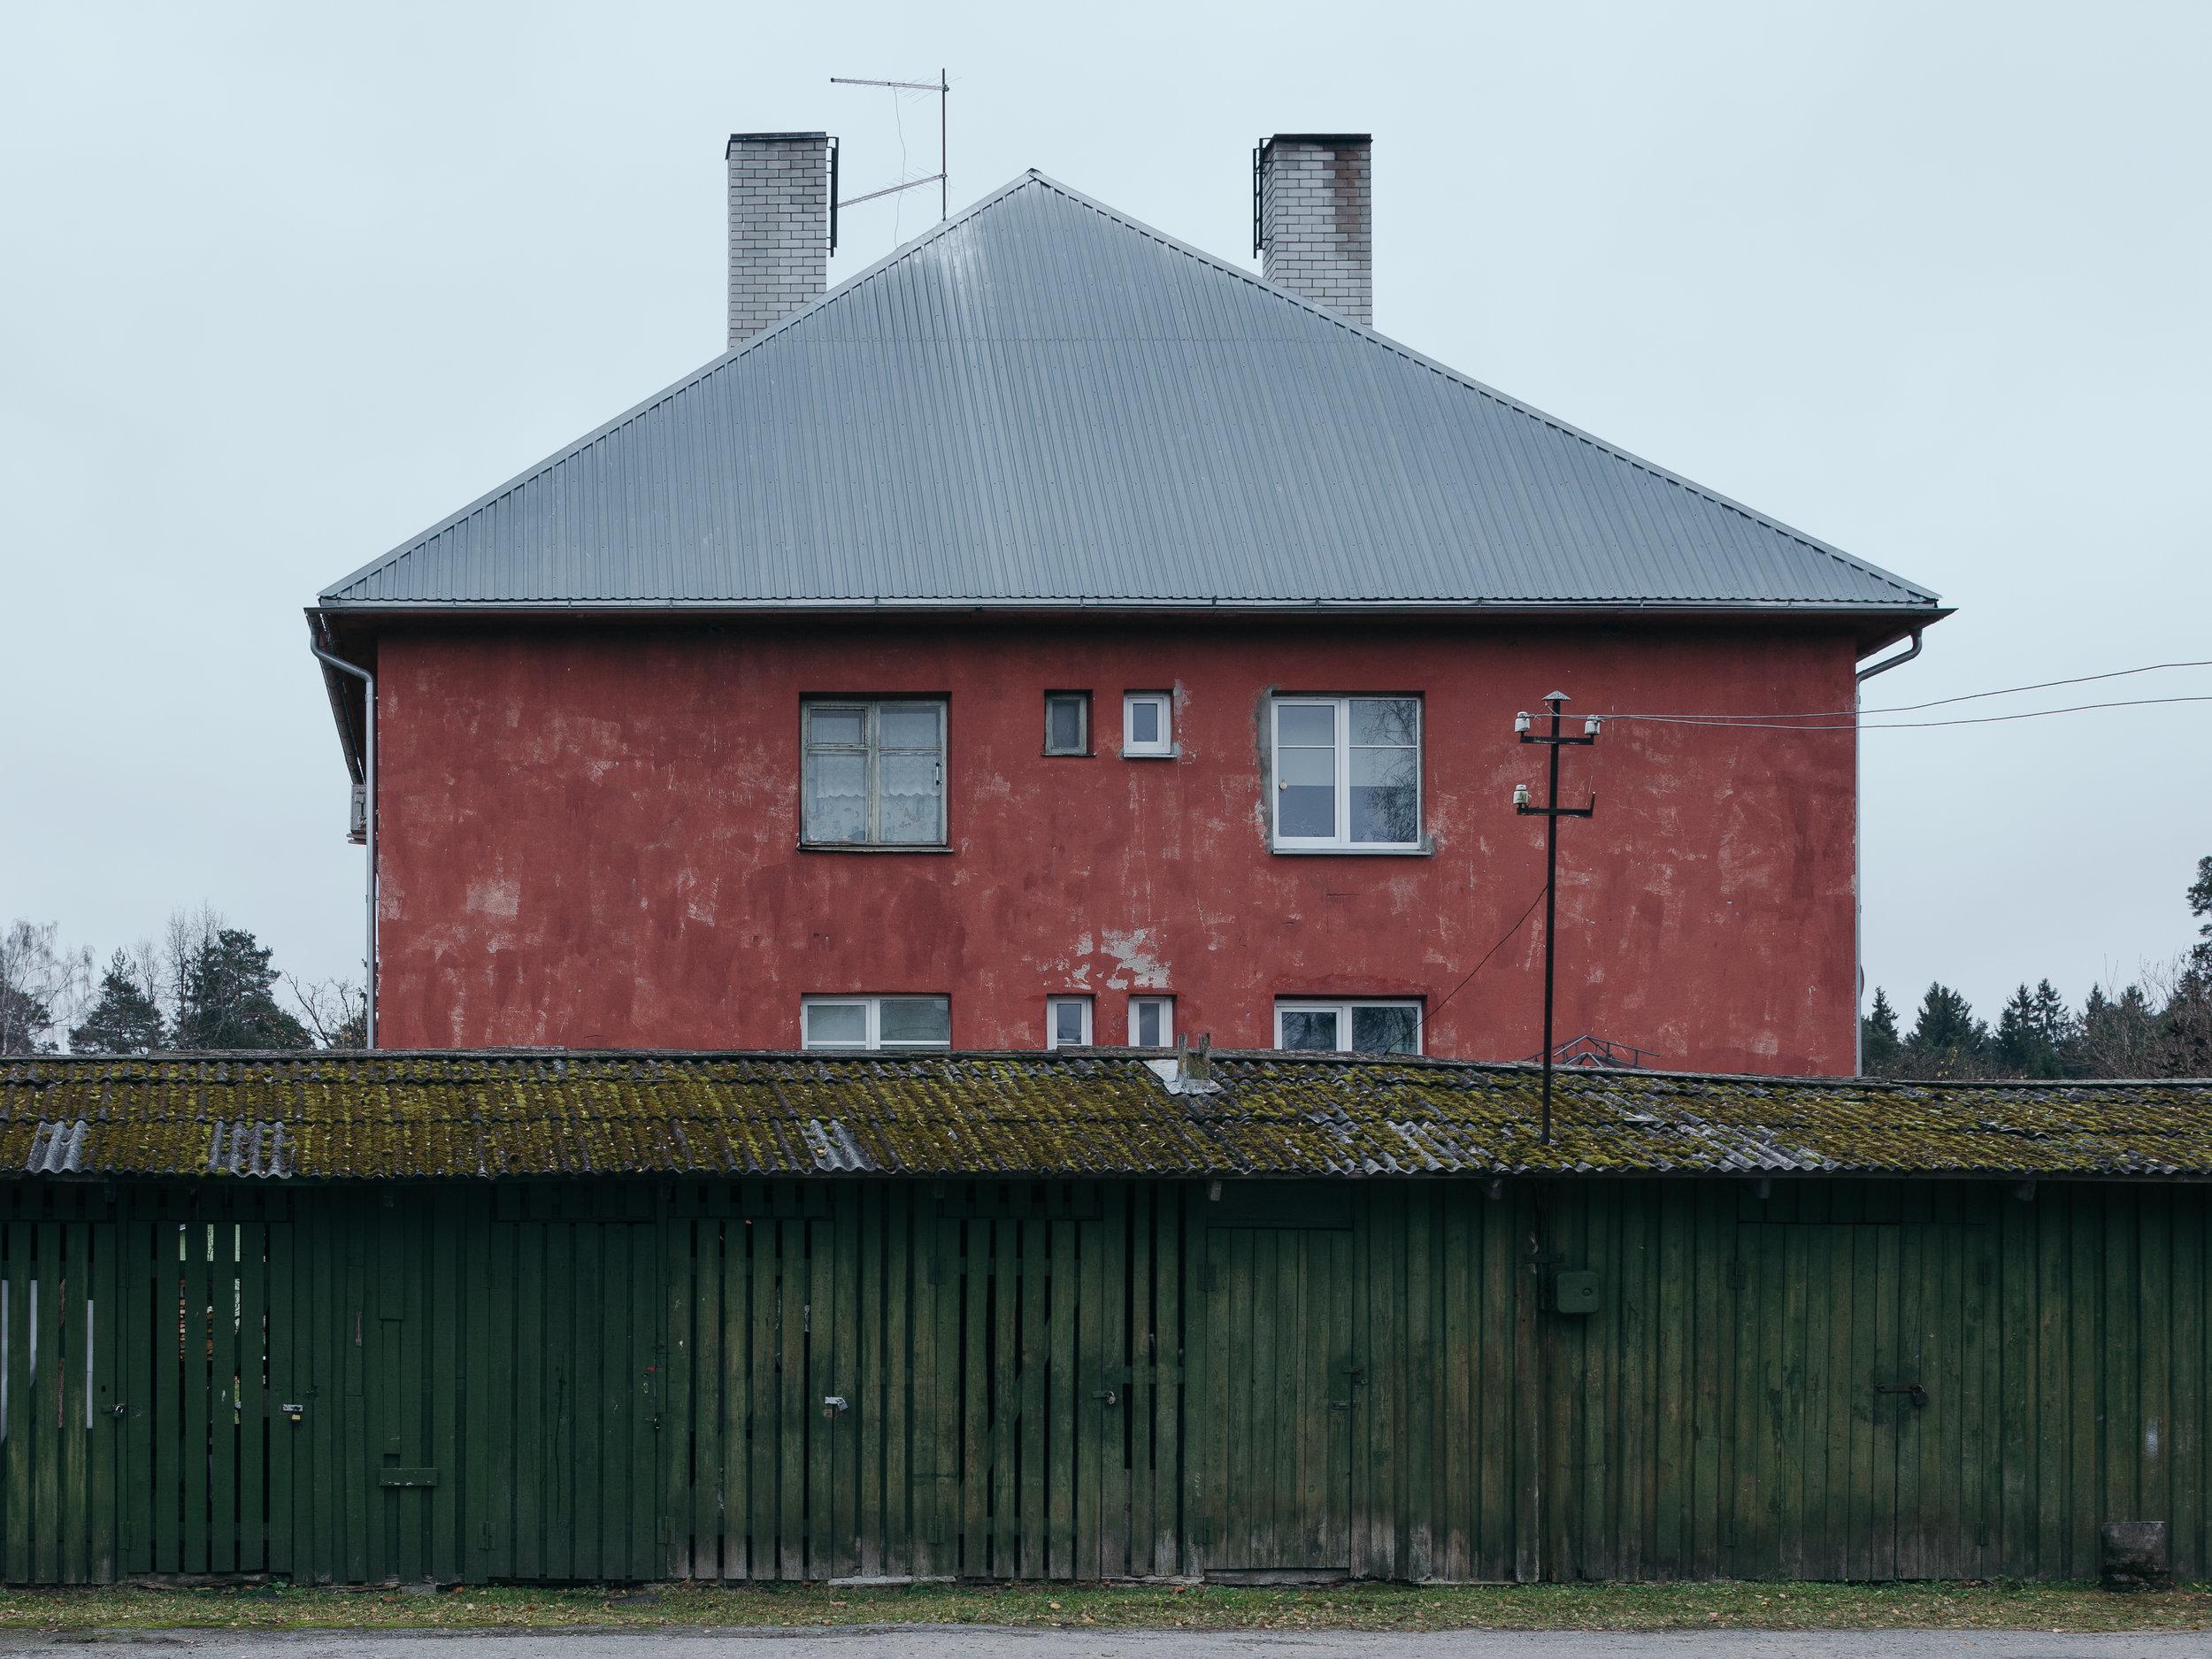 Elva, Estonia, November 2018